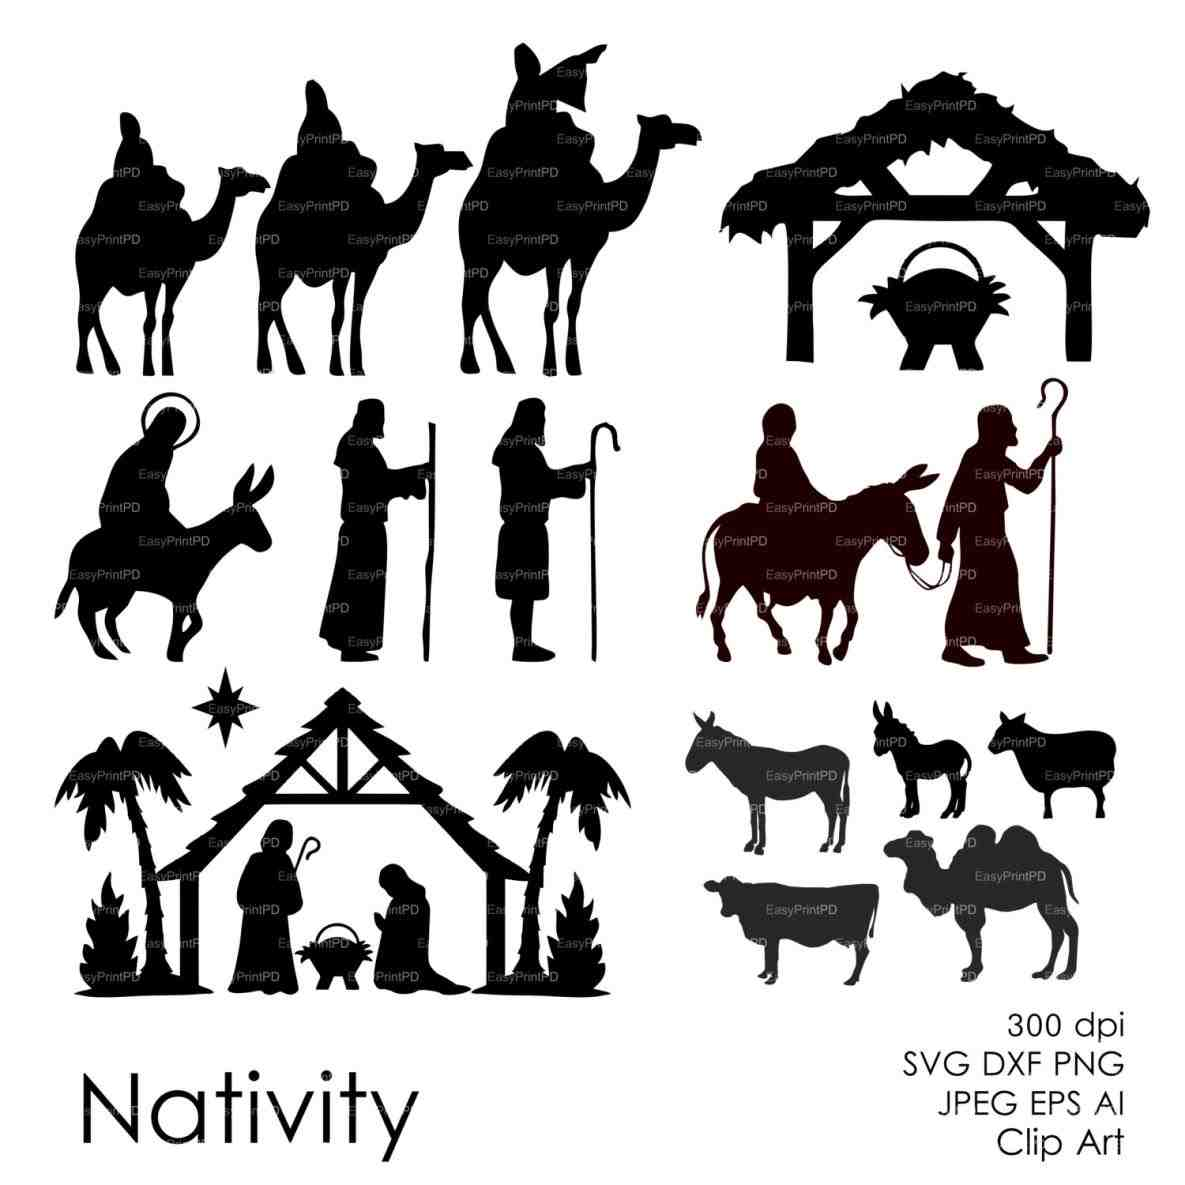 1185x1185 Christmas Nativity Scene Clip Art Cheminee.website